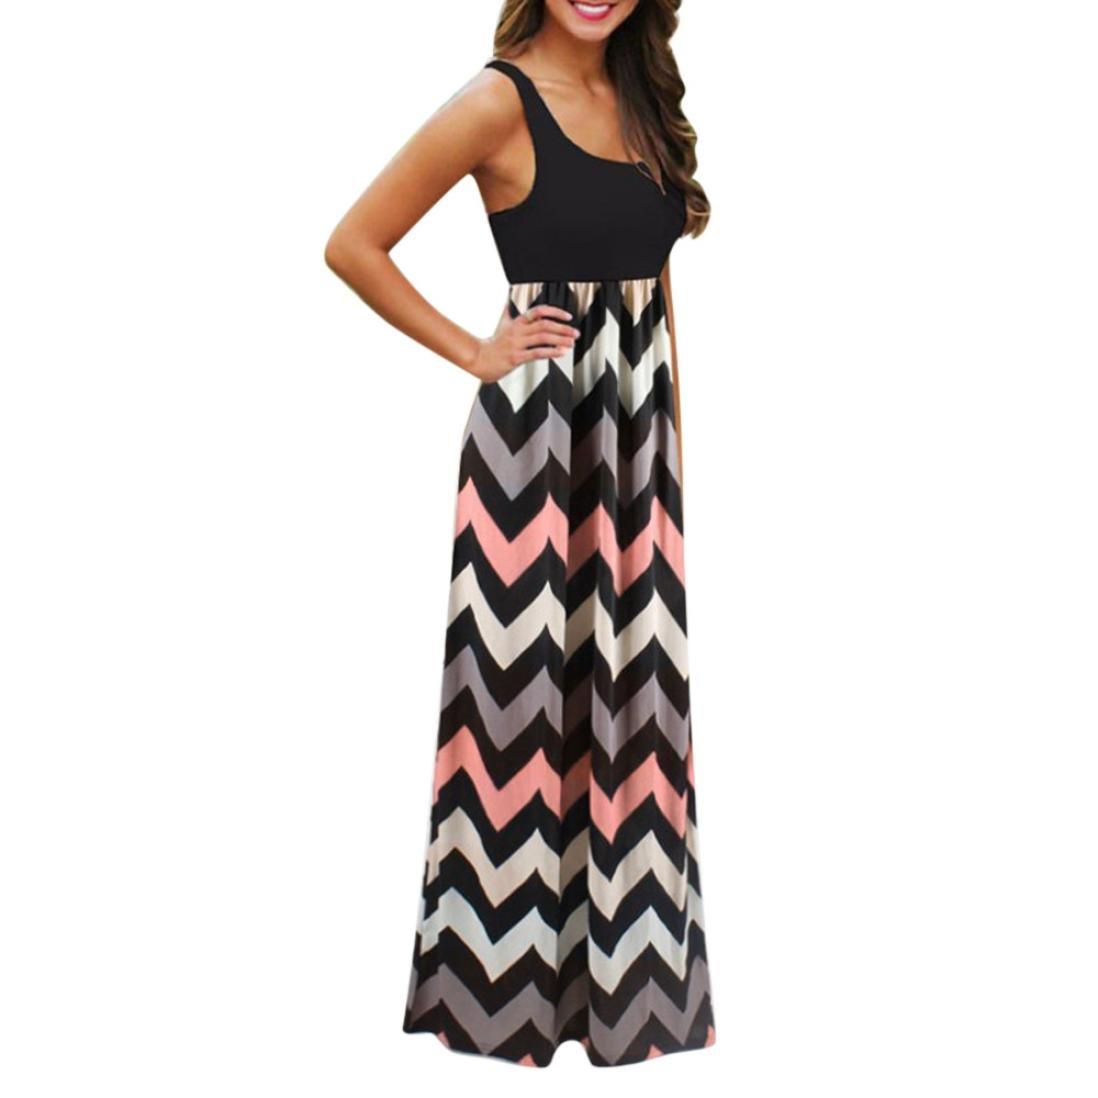 Striped Boho Long Dress, AgrinTol Womens Summer Plus Size Striped Boho Long Dress (M, Black)